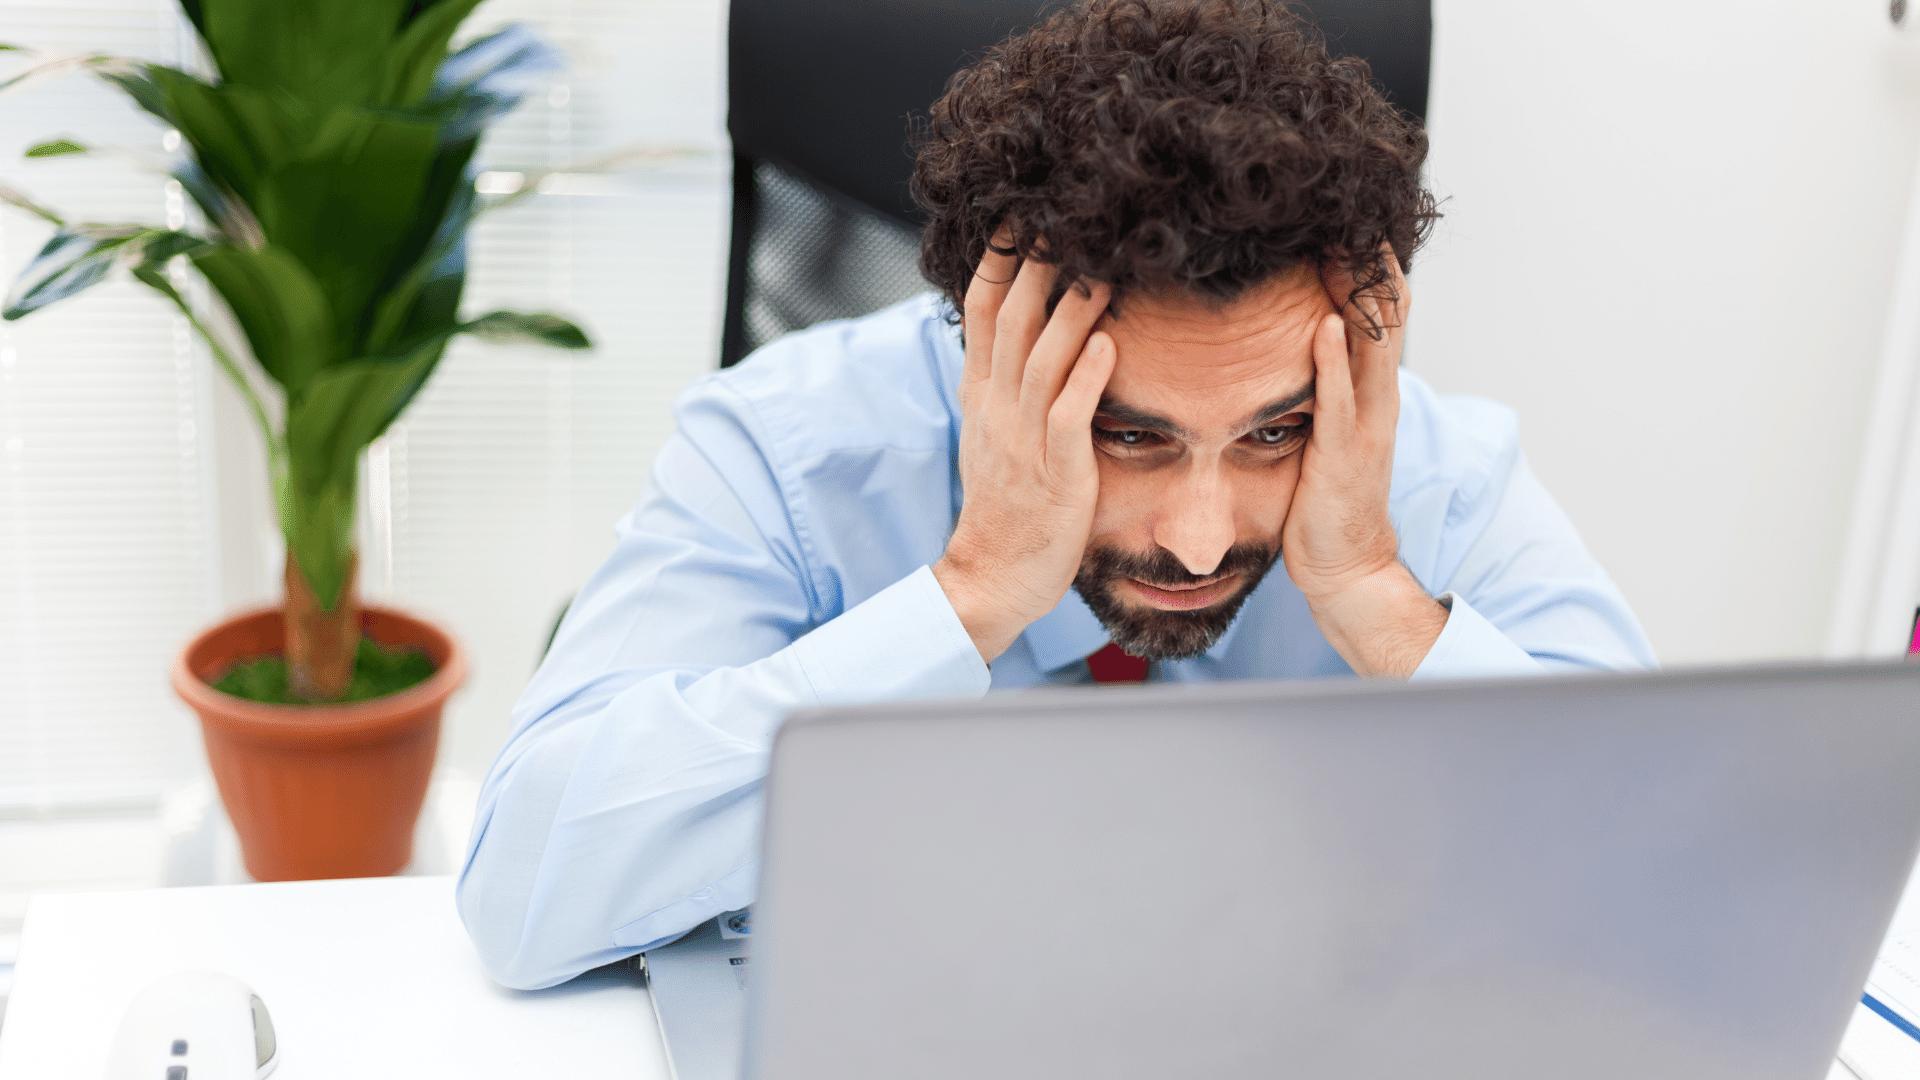 Manager si dispera davanti al computer portatile